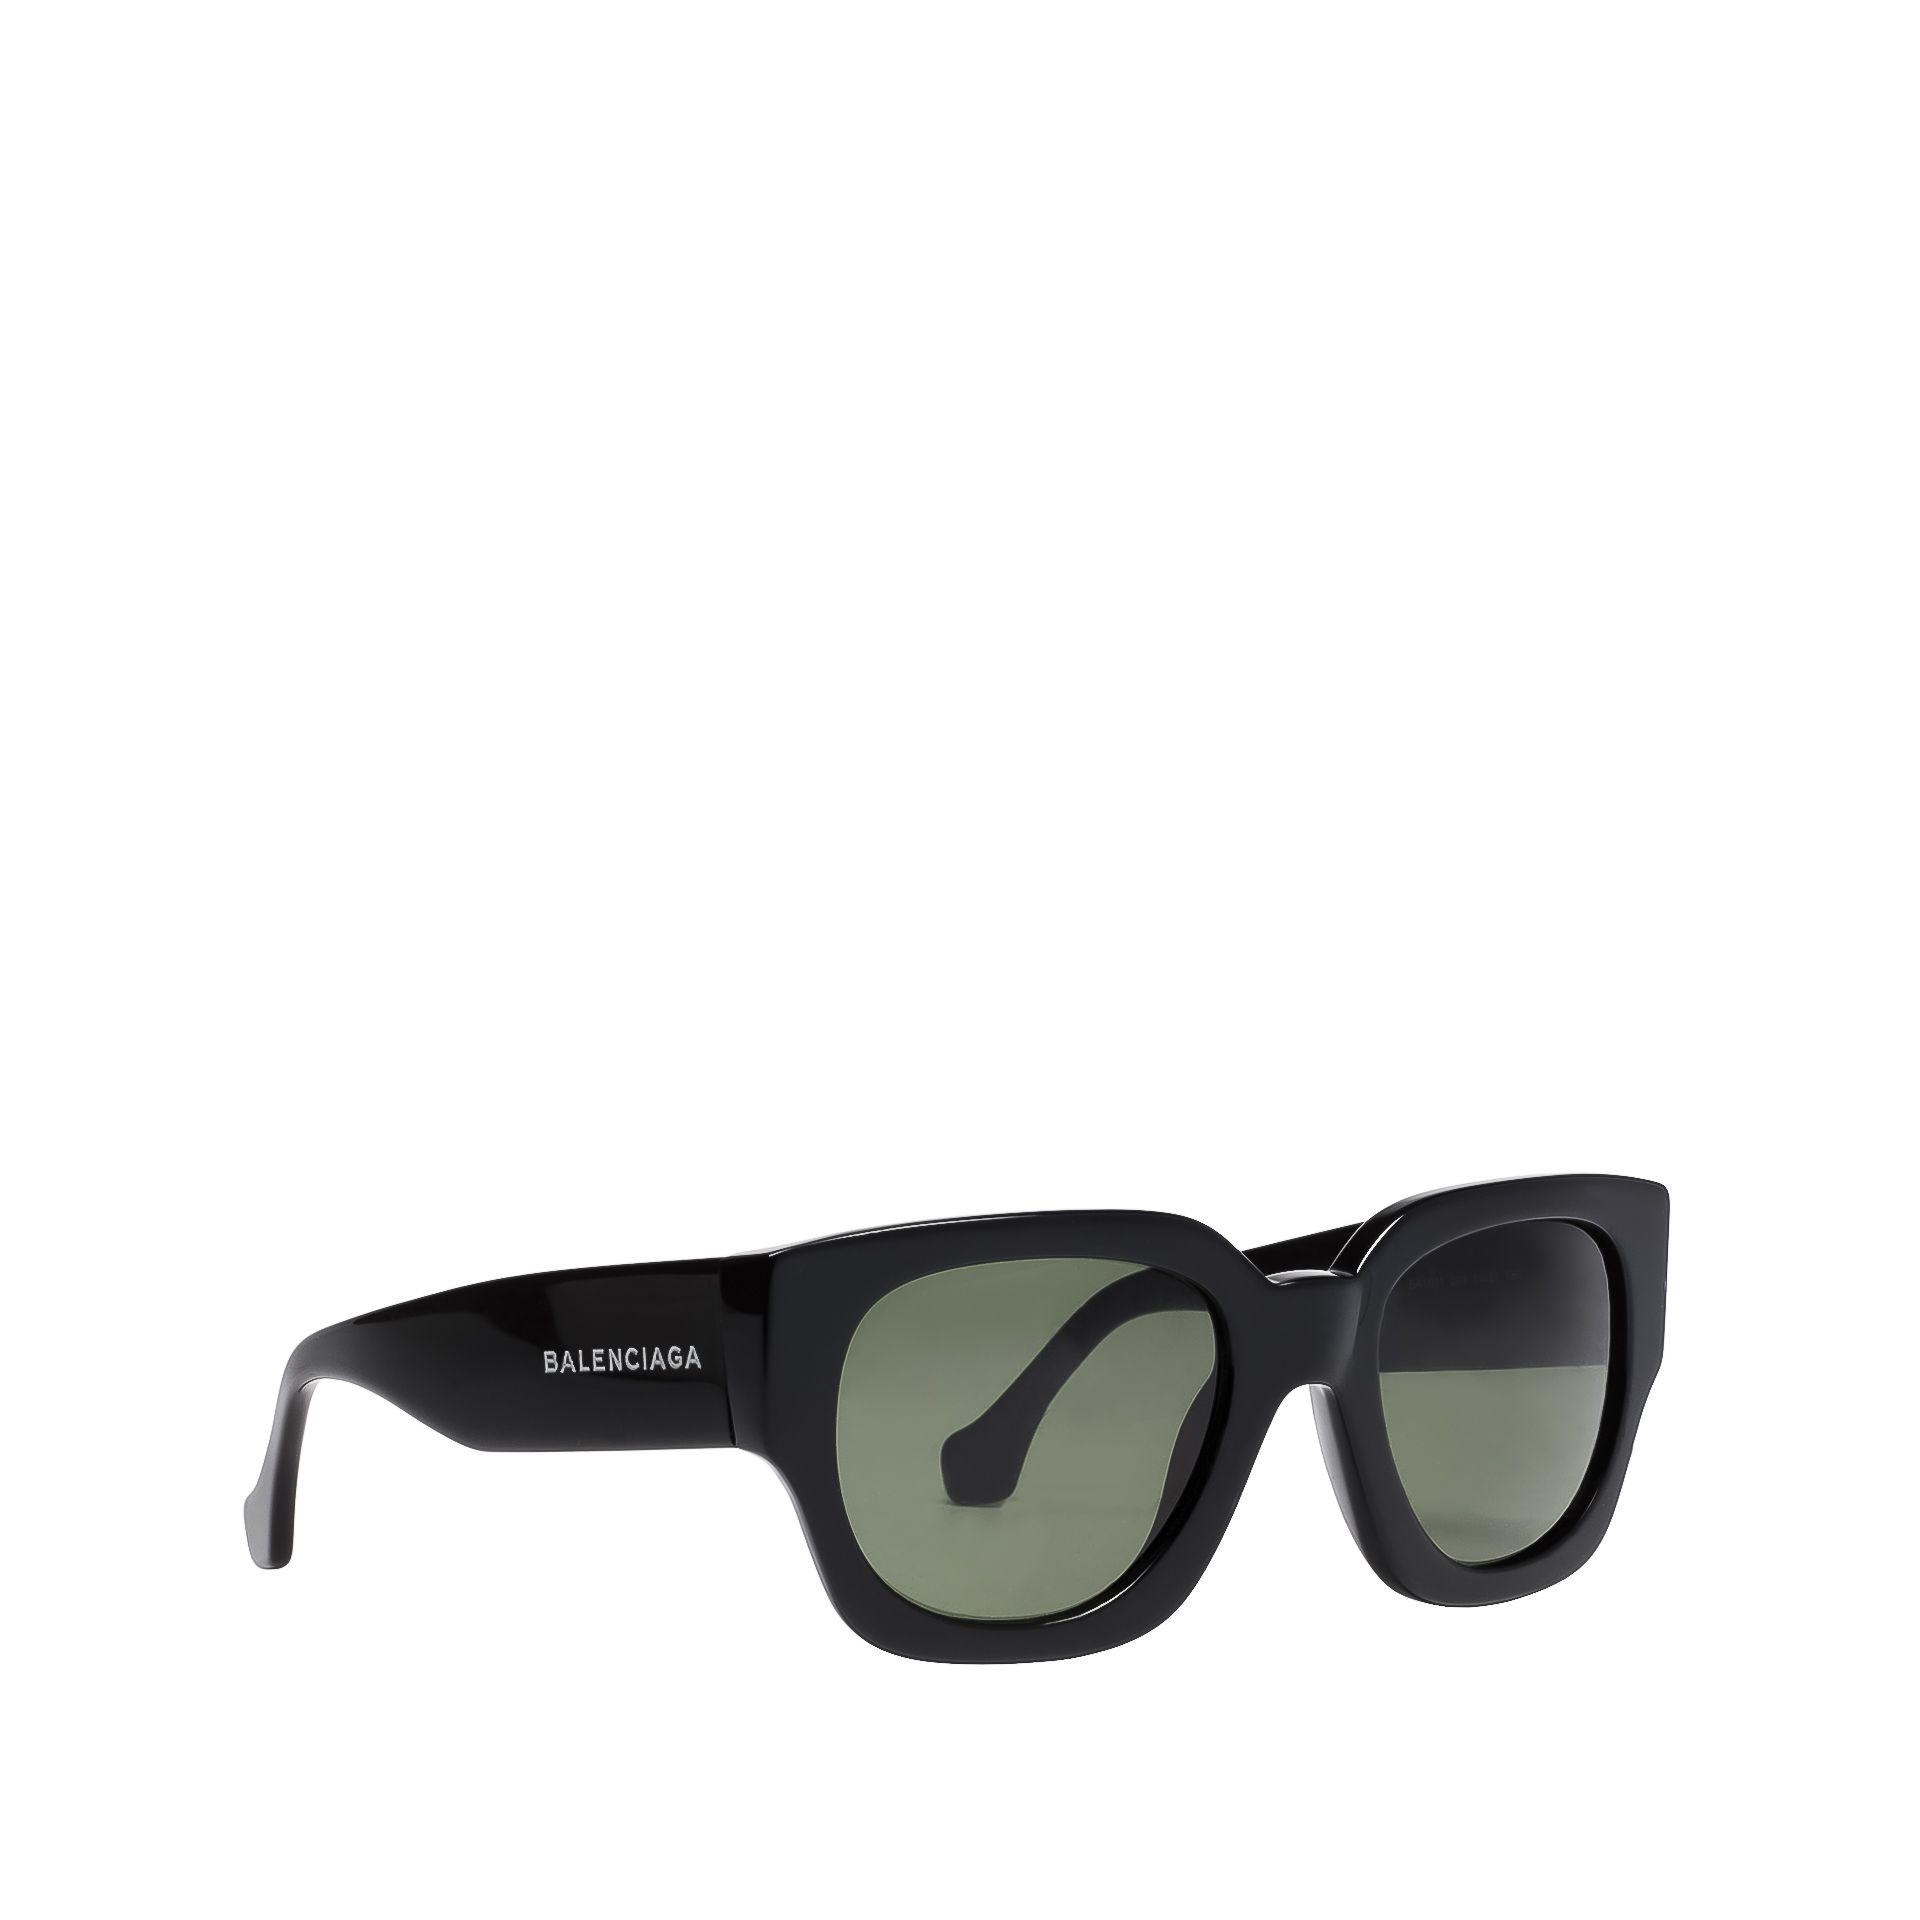 BALENCIAGA Balenciaga Sunglasses Sunglasses D f